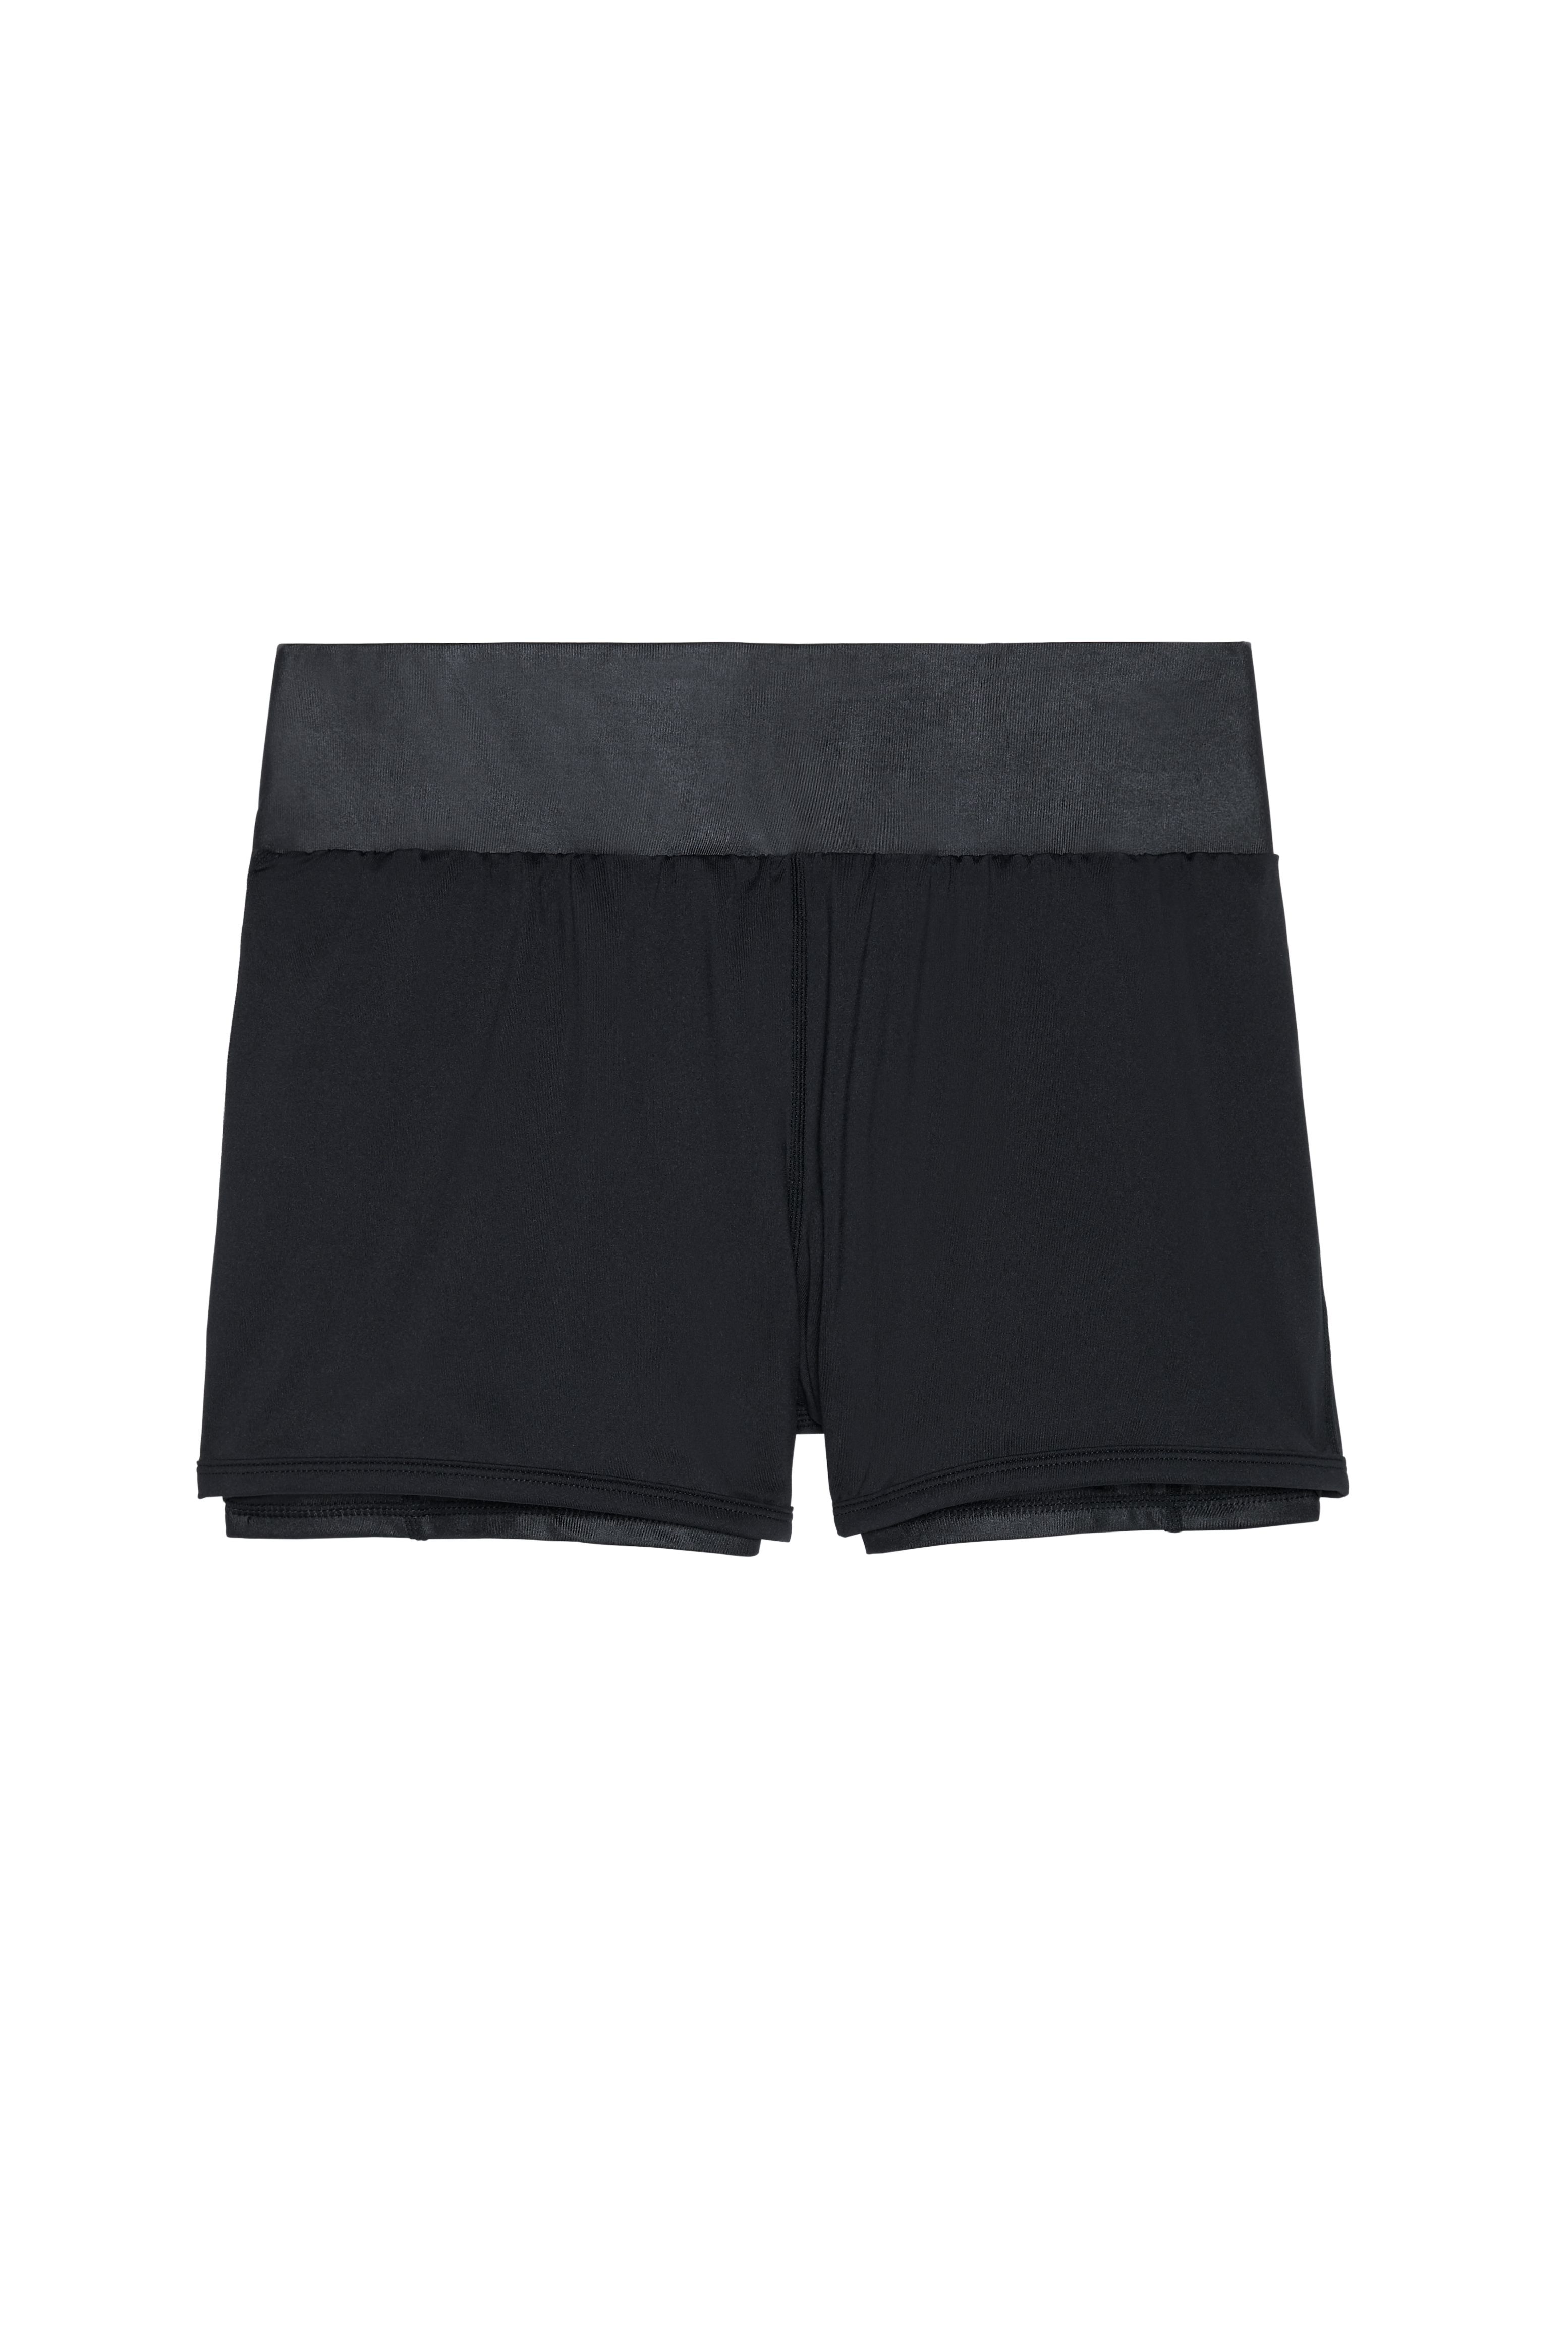 Nike Elevate 5'' Shorts Damen